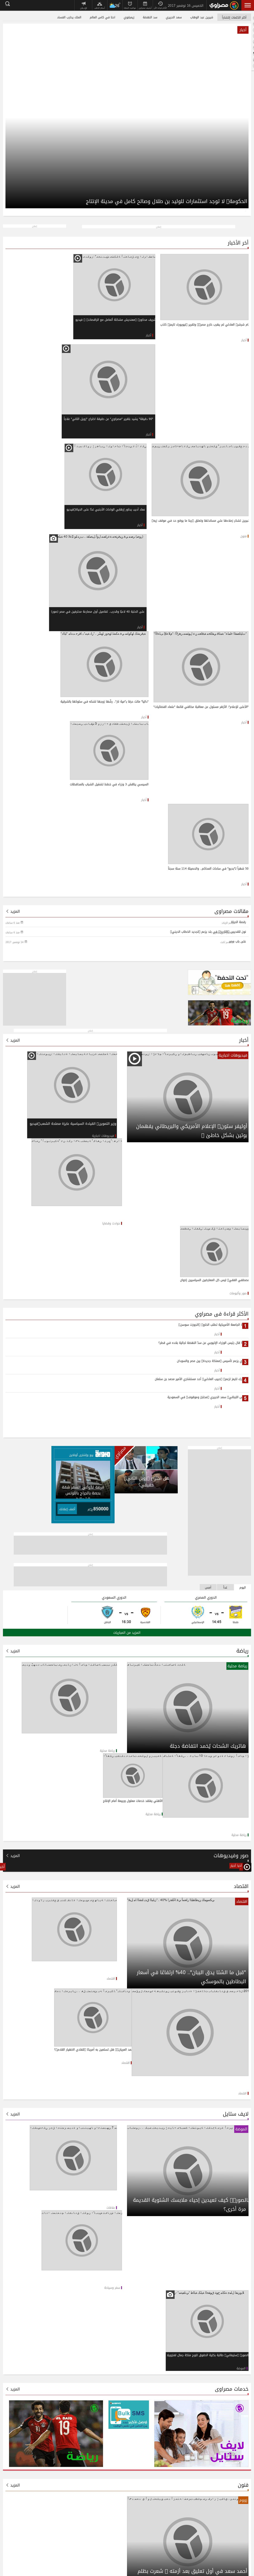 Masrawy at Wednesday Nov. 15, 2017, 11:09 p.m. UTC